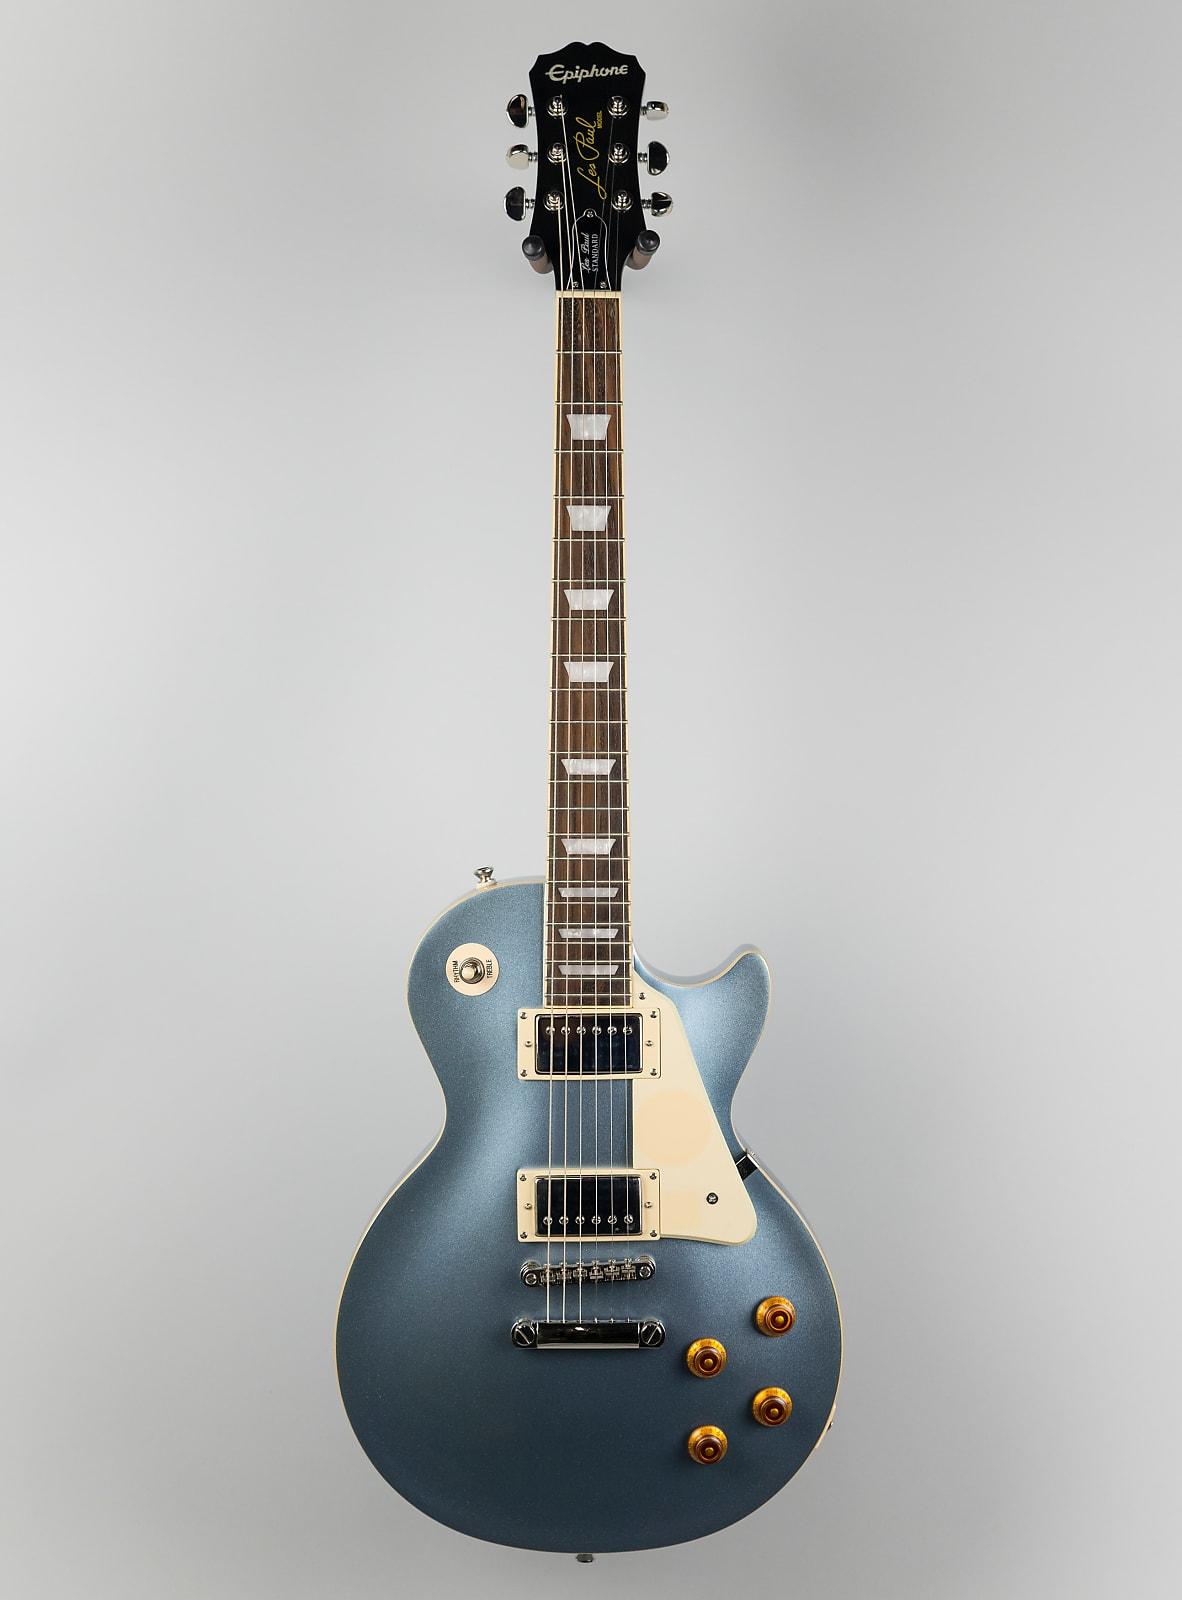 Used Epiphone Les Paul Standard In Pelham Blue